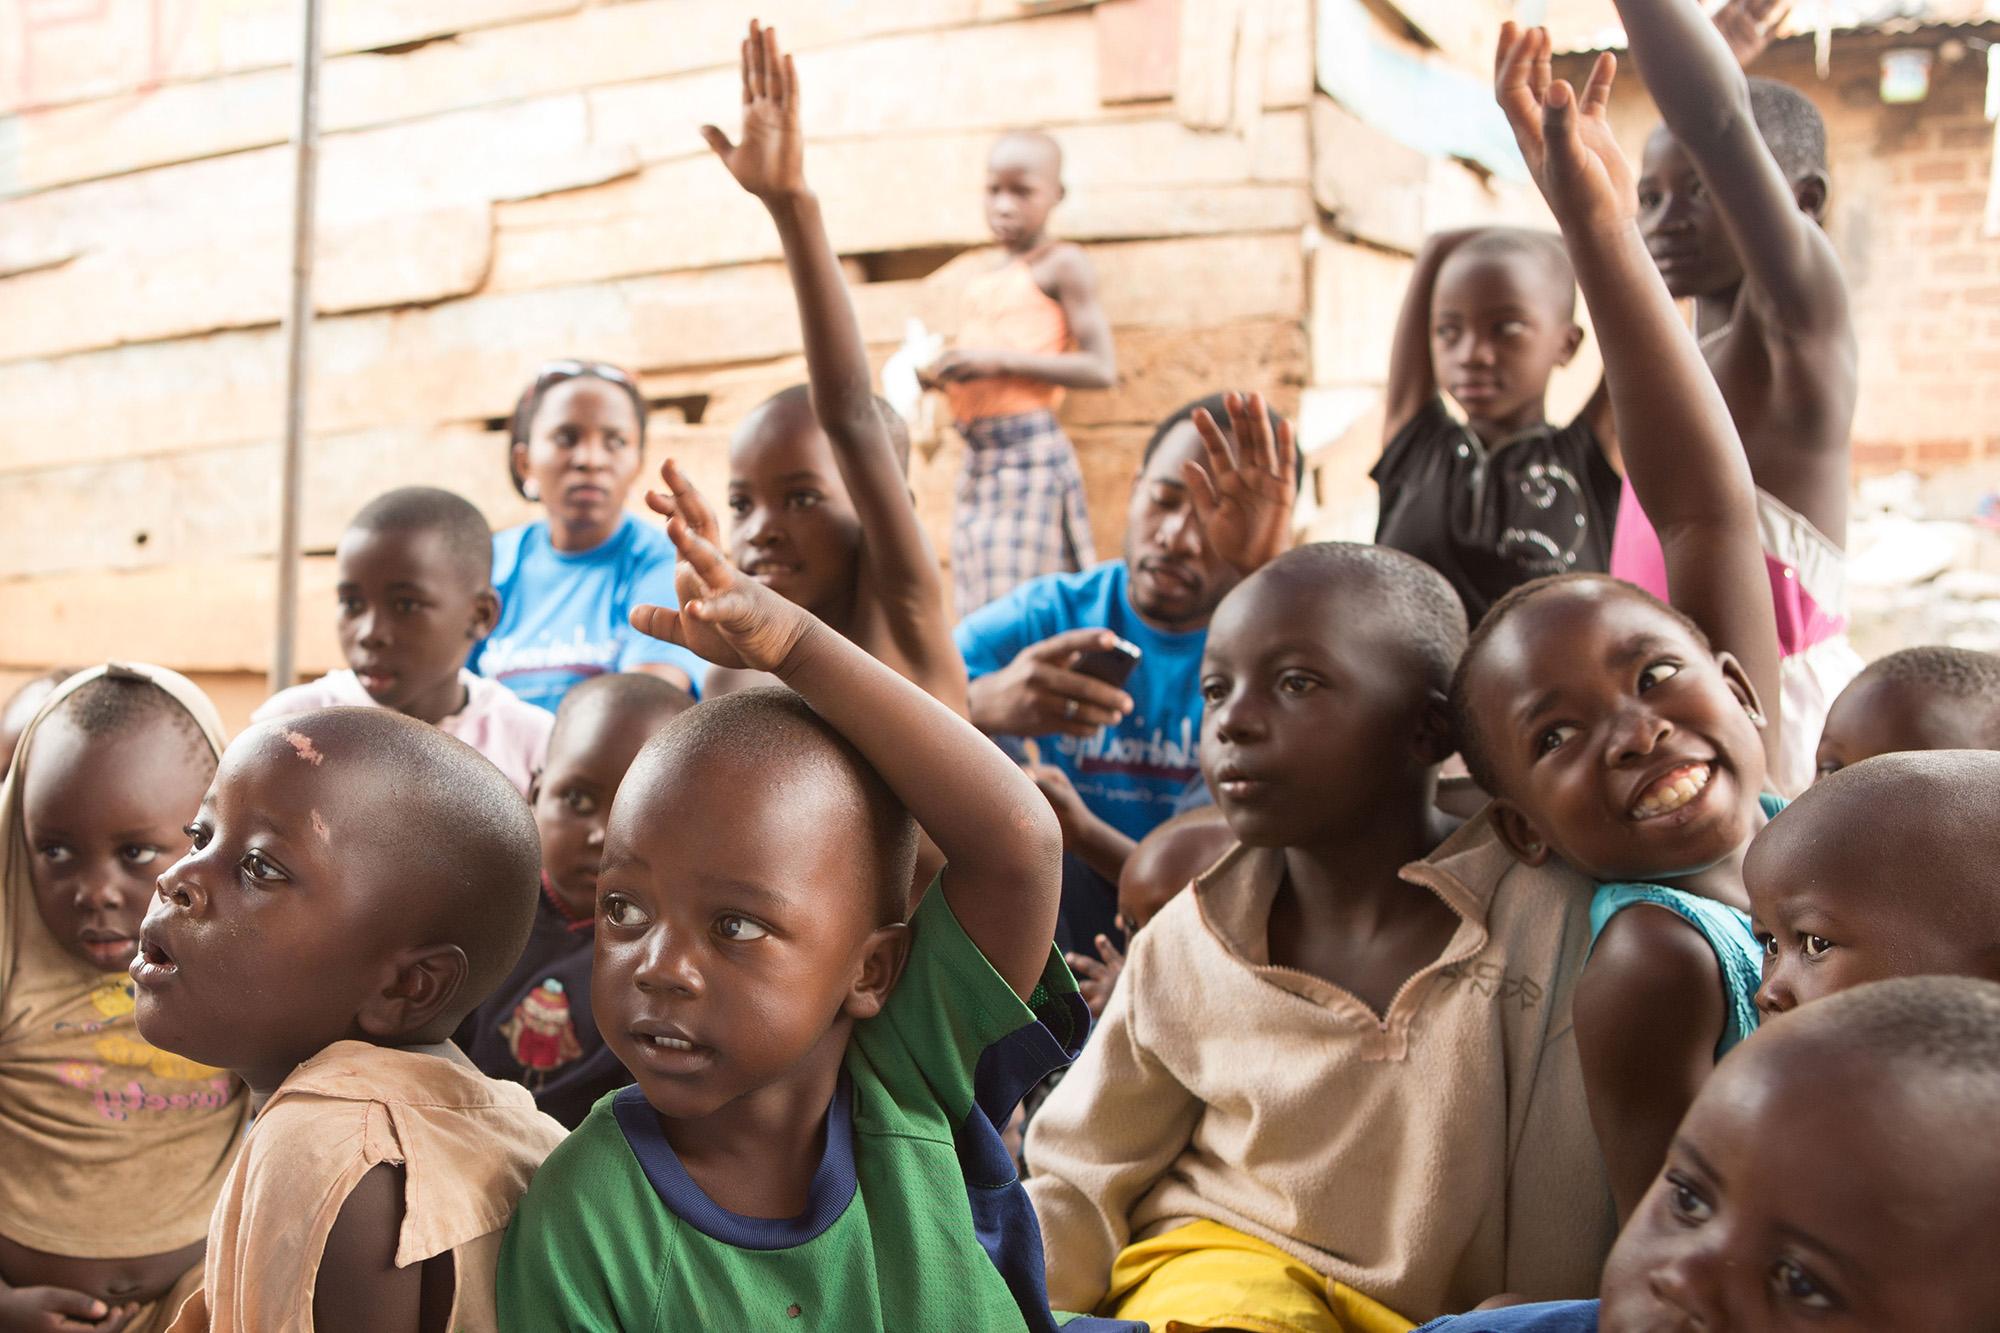 children volunteering, putting their hands up